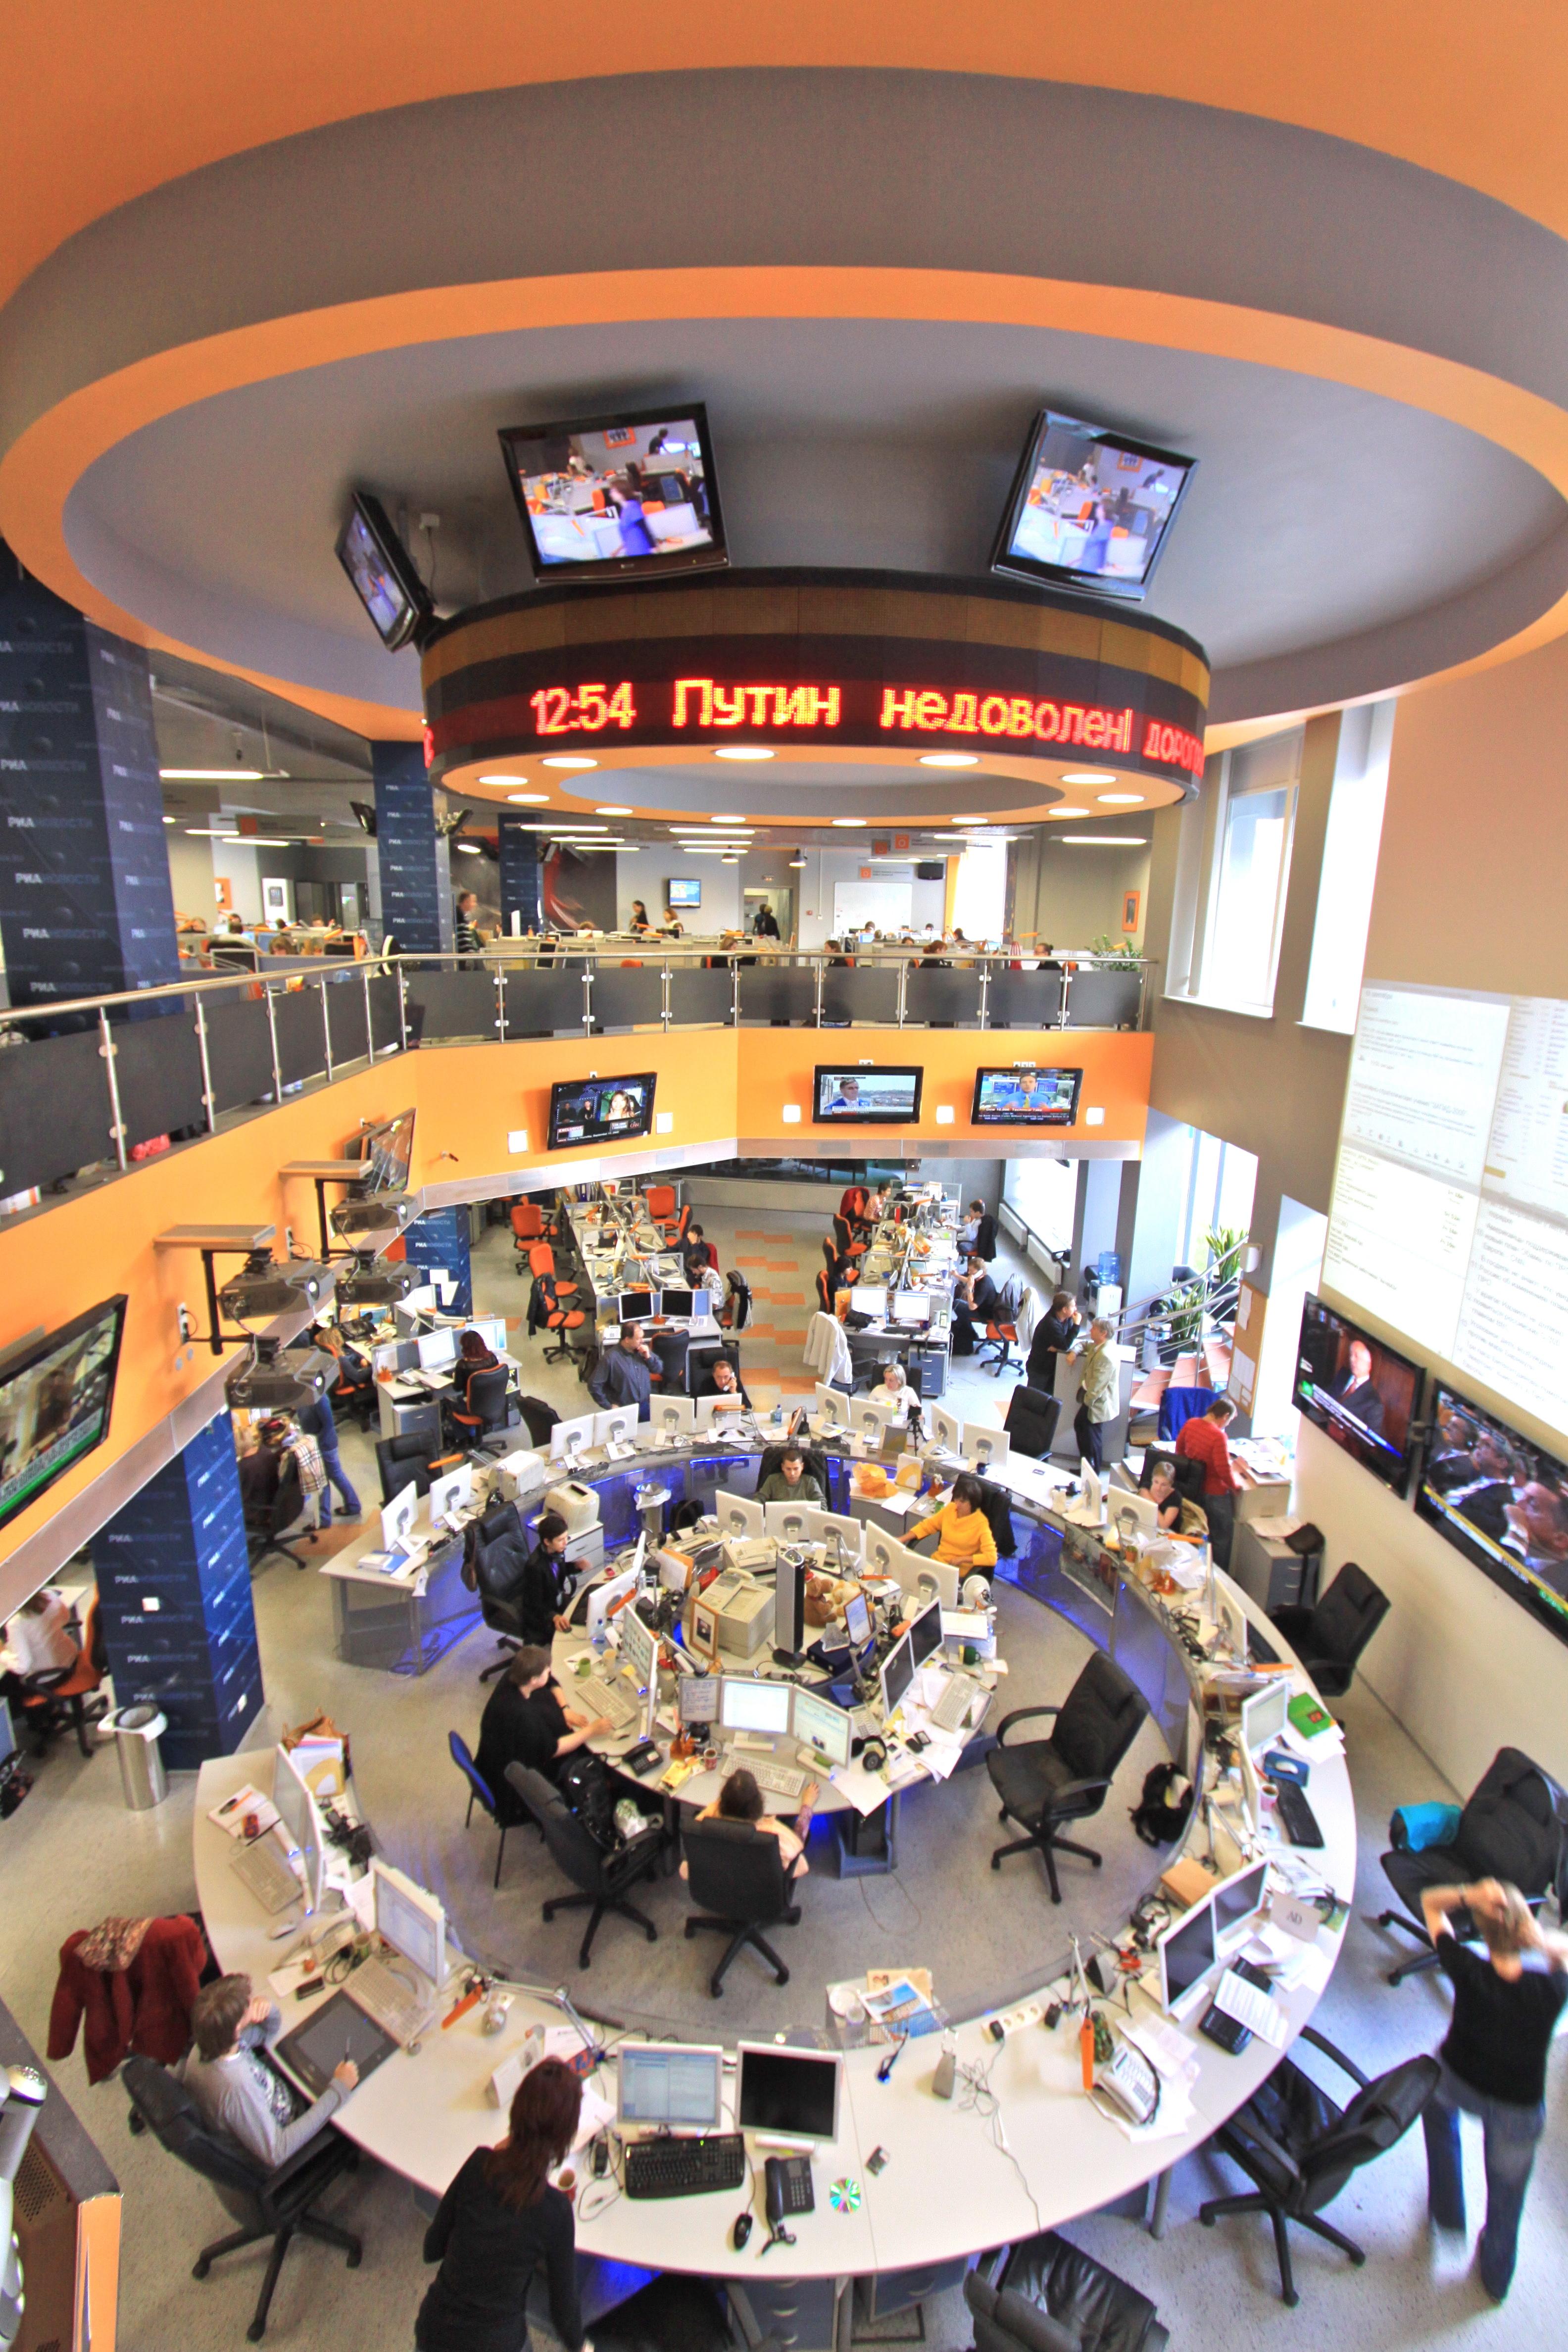 File:Newsroom RIA Novosti, Moscow.jpg - Wikimedia Commons